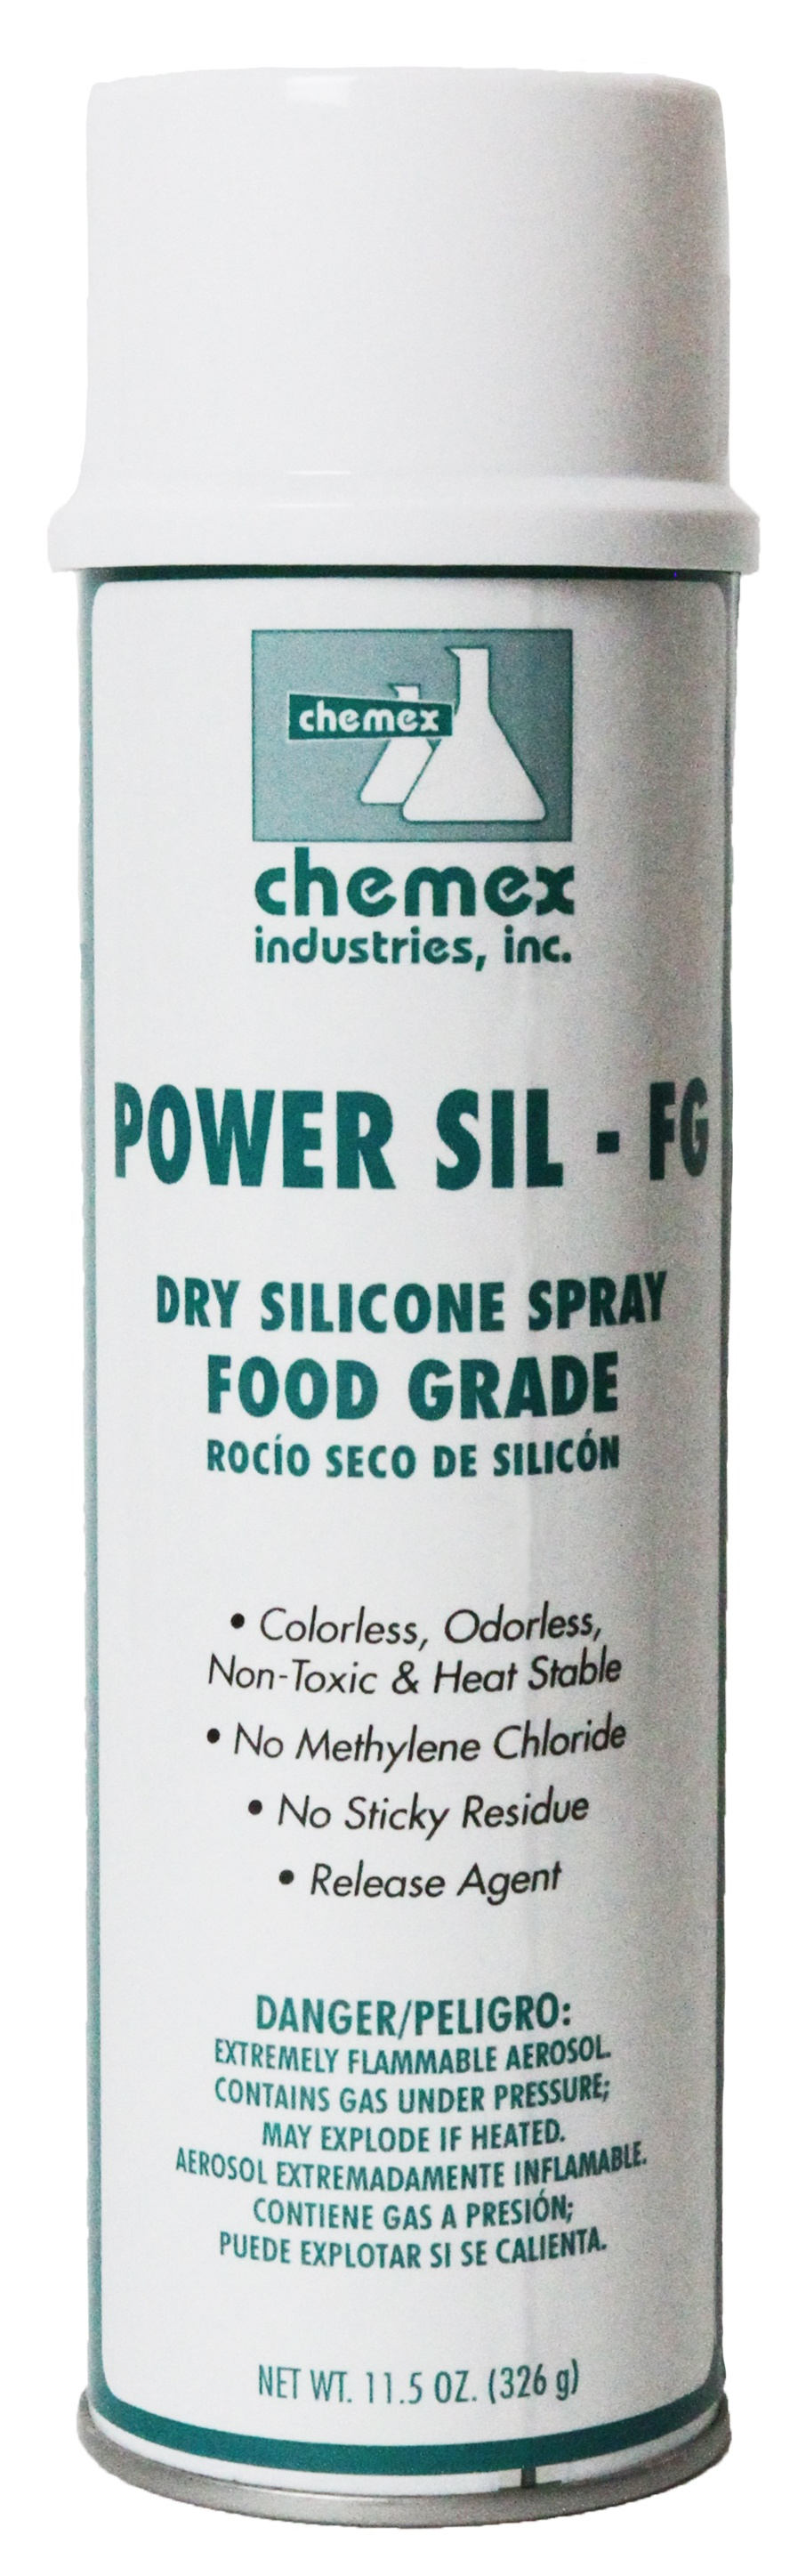 dry silicone spray food grade